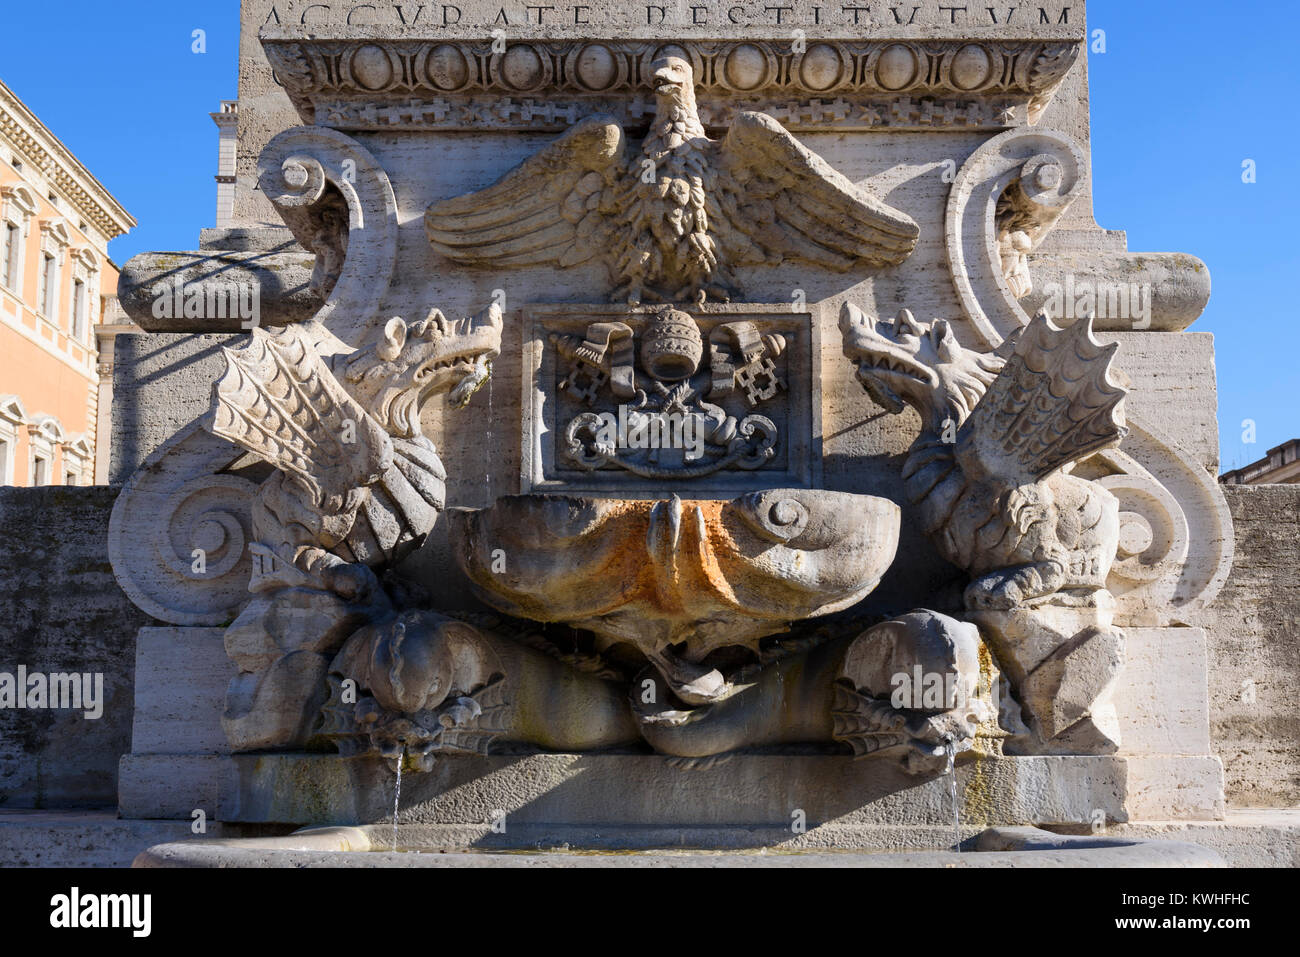 Fountain of the Lateran Obelisk in Saint John, Rome, Lazio, Italy - Stock Image